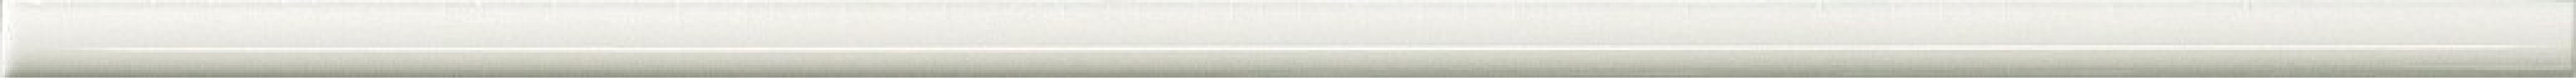 Бордюр Antica Ceramica Rubiera Alterego List. Bianco 1x40 201425